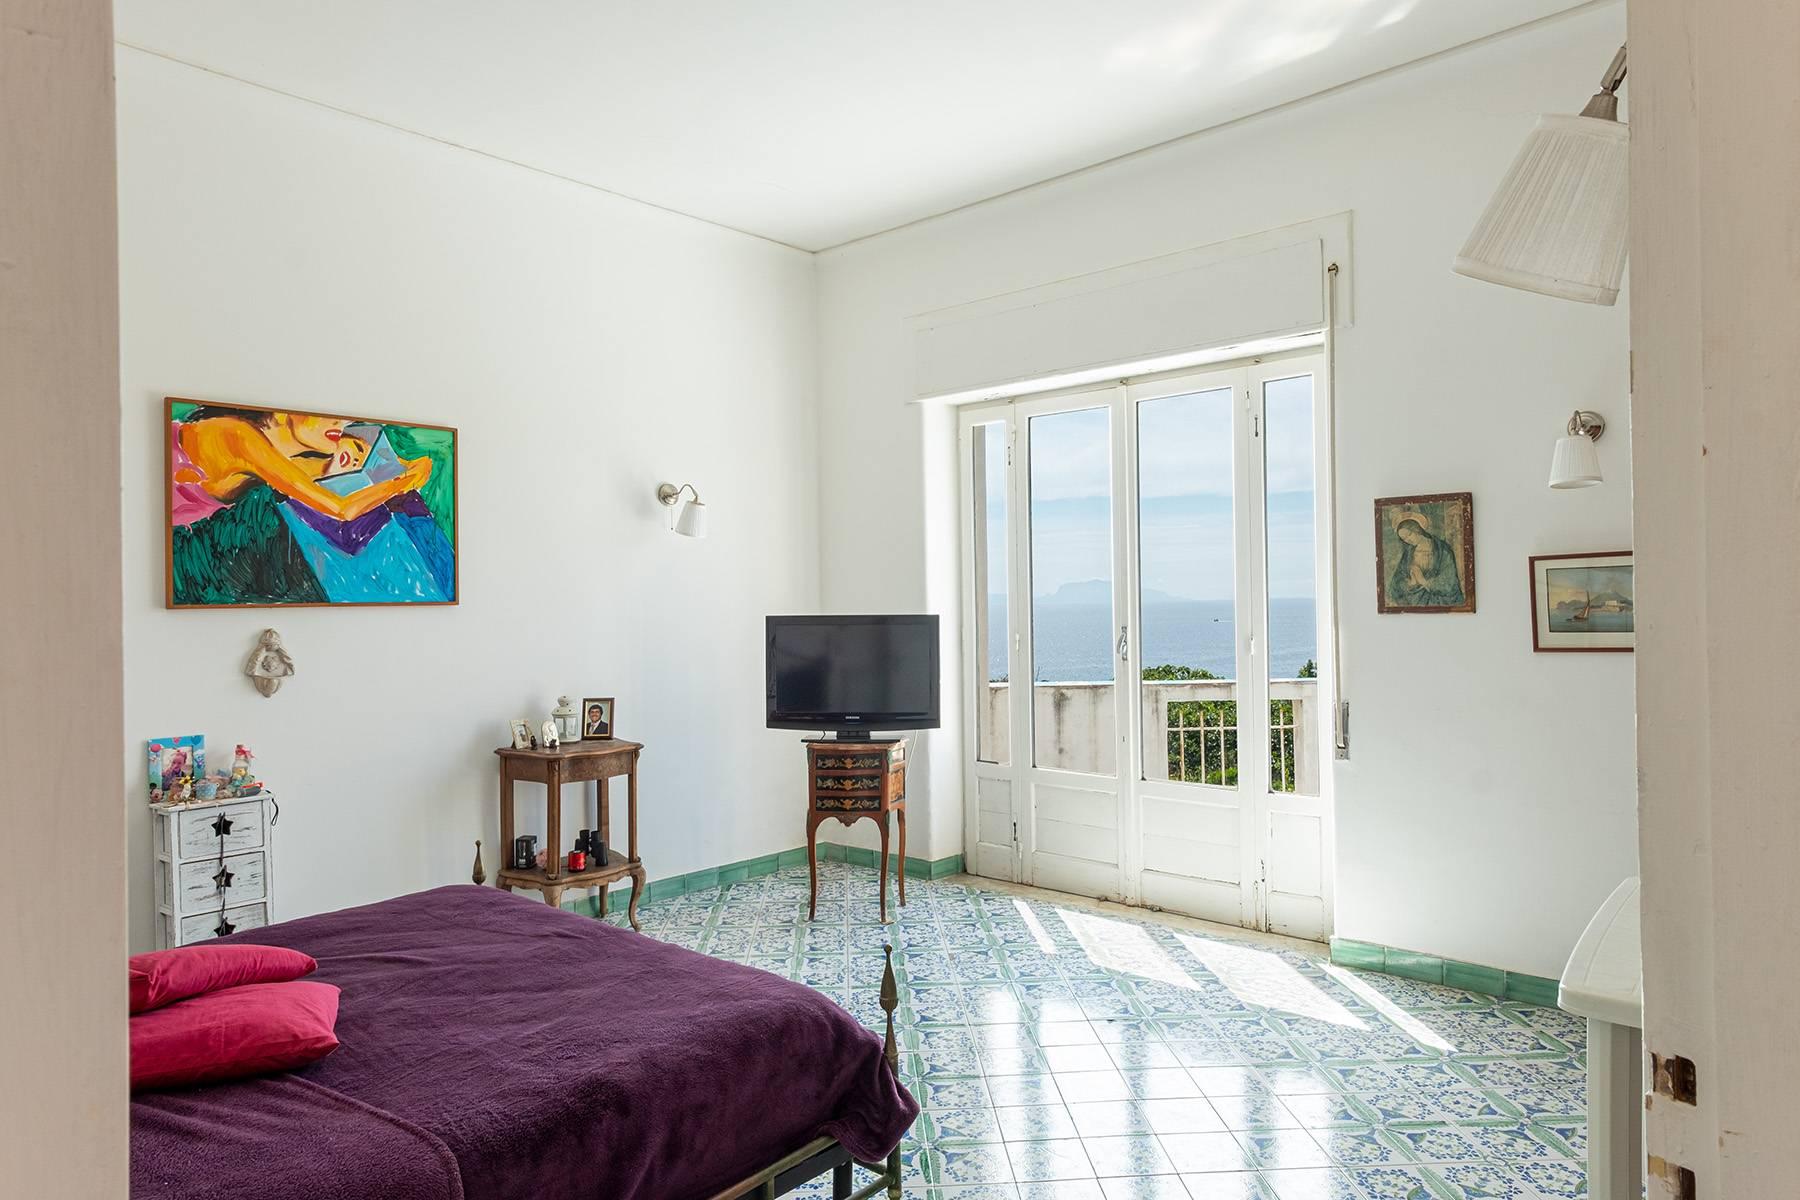 Casa indipendente in Vendita a Procida: 5 locali, 300 mq - Foto 9